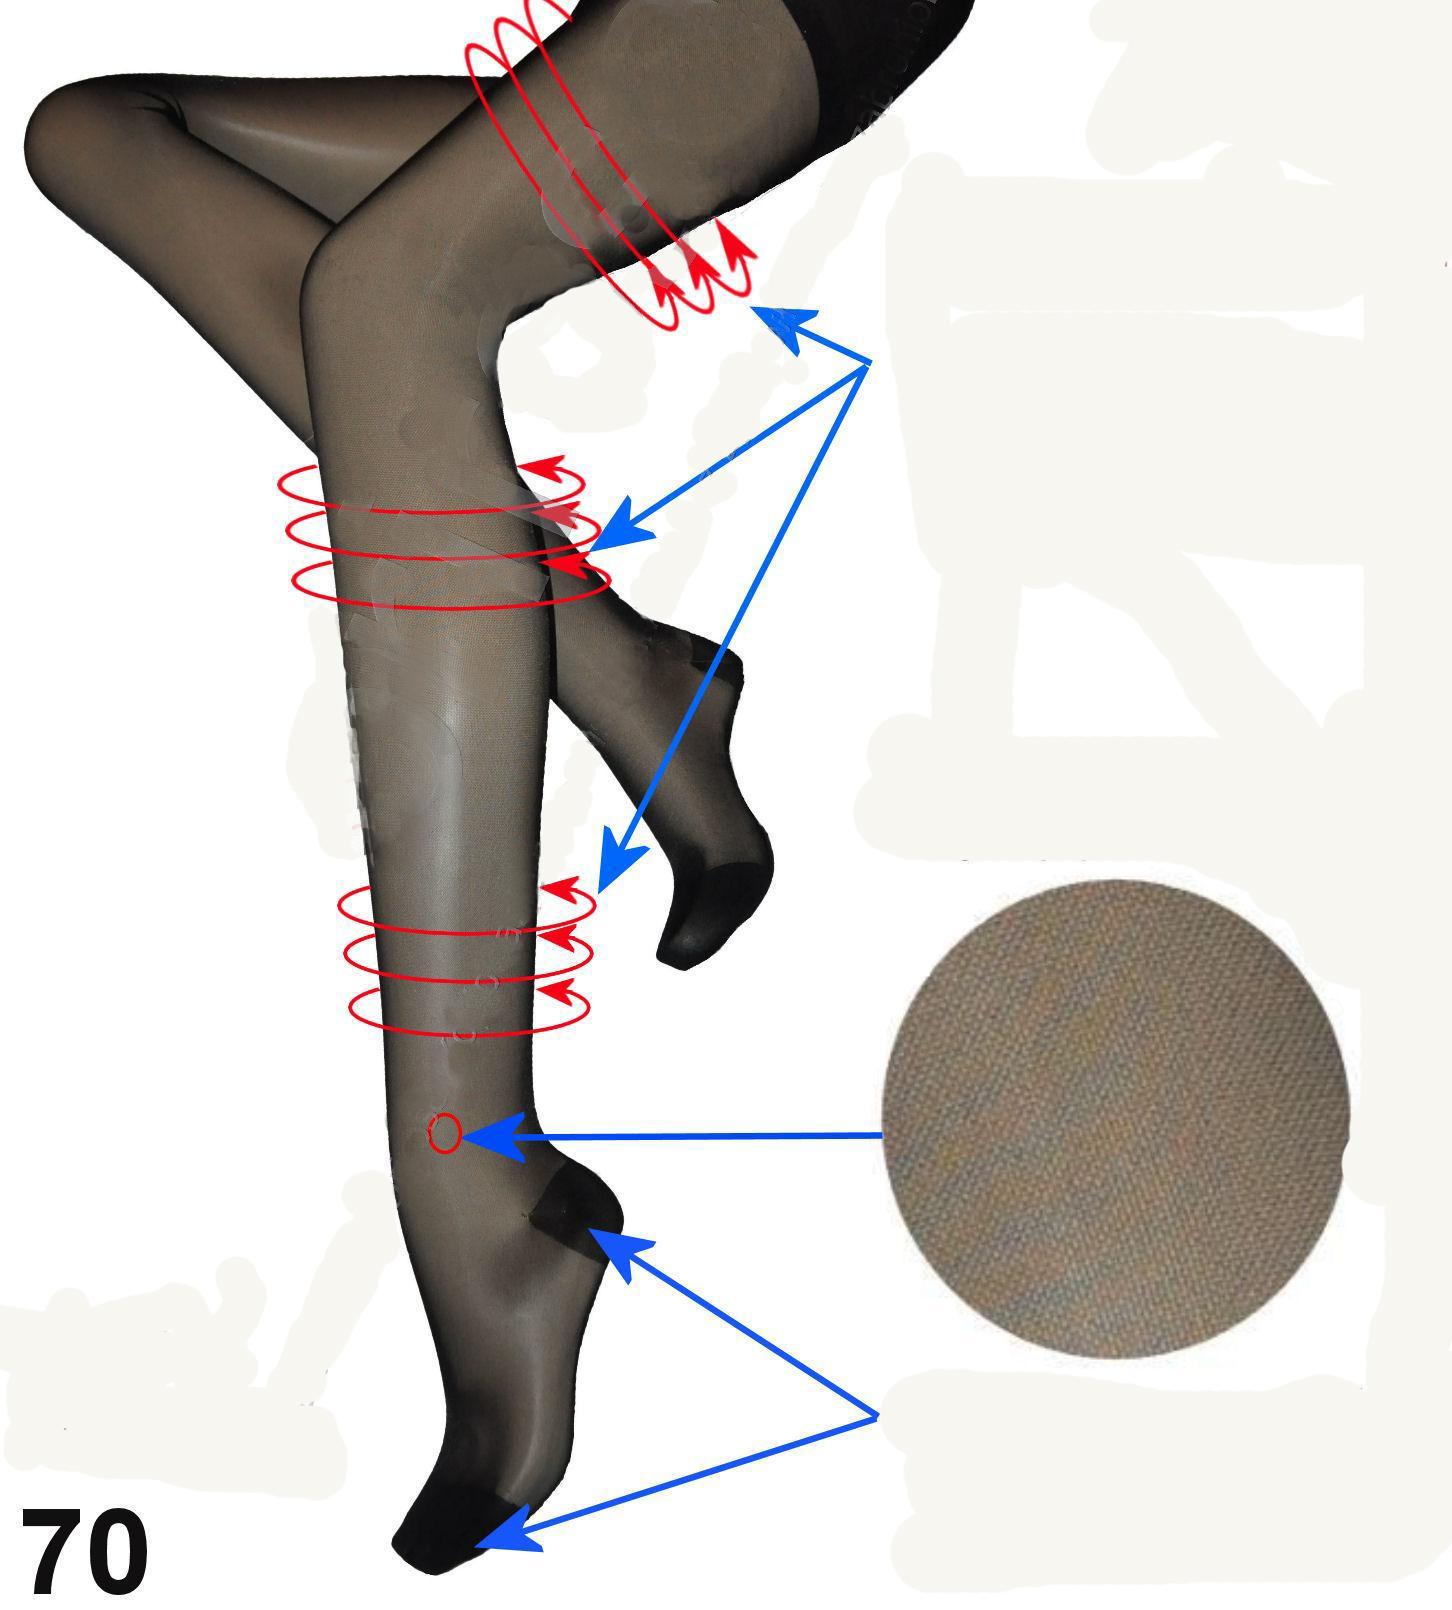 Orirose 0060 Damen Strumpfhose Shapewear Stützfunktion M -XXL Schwarz